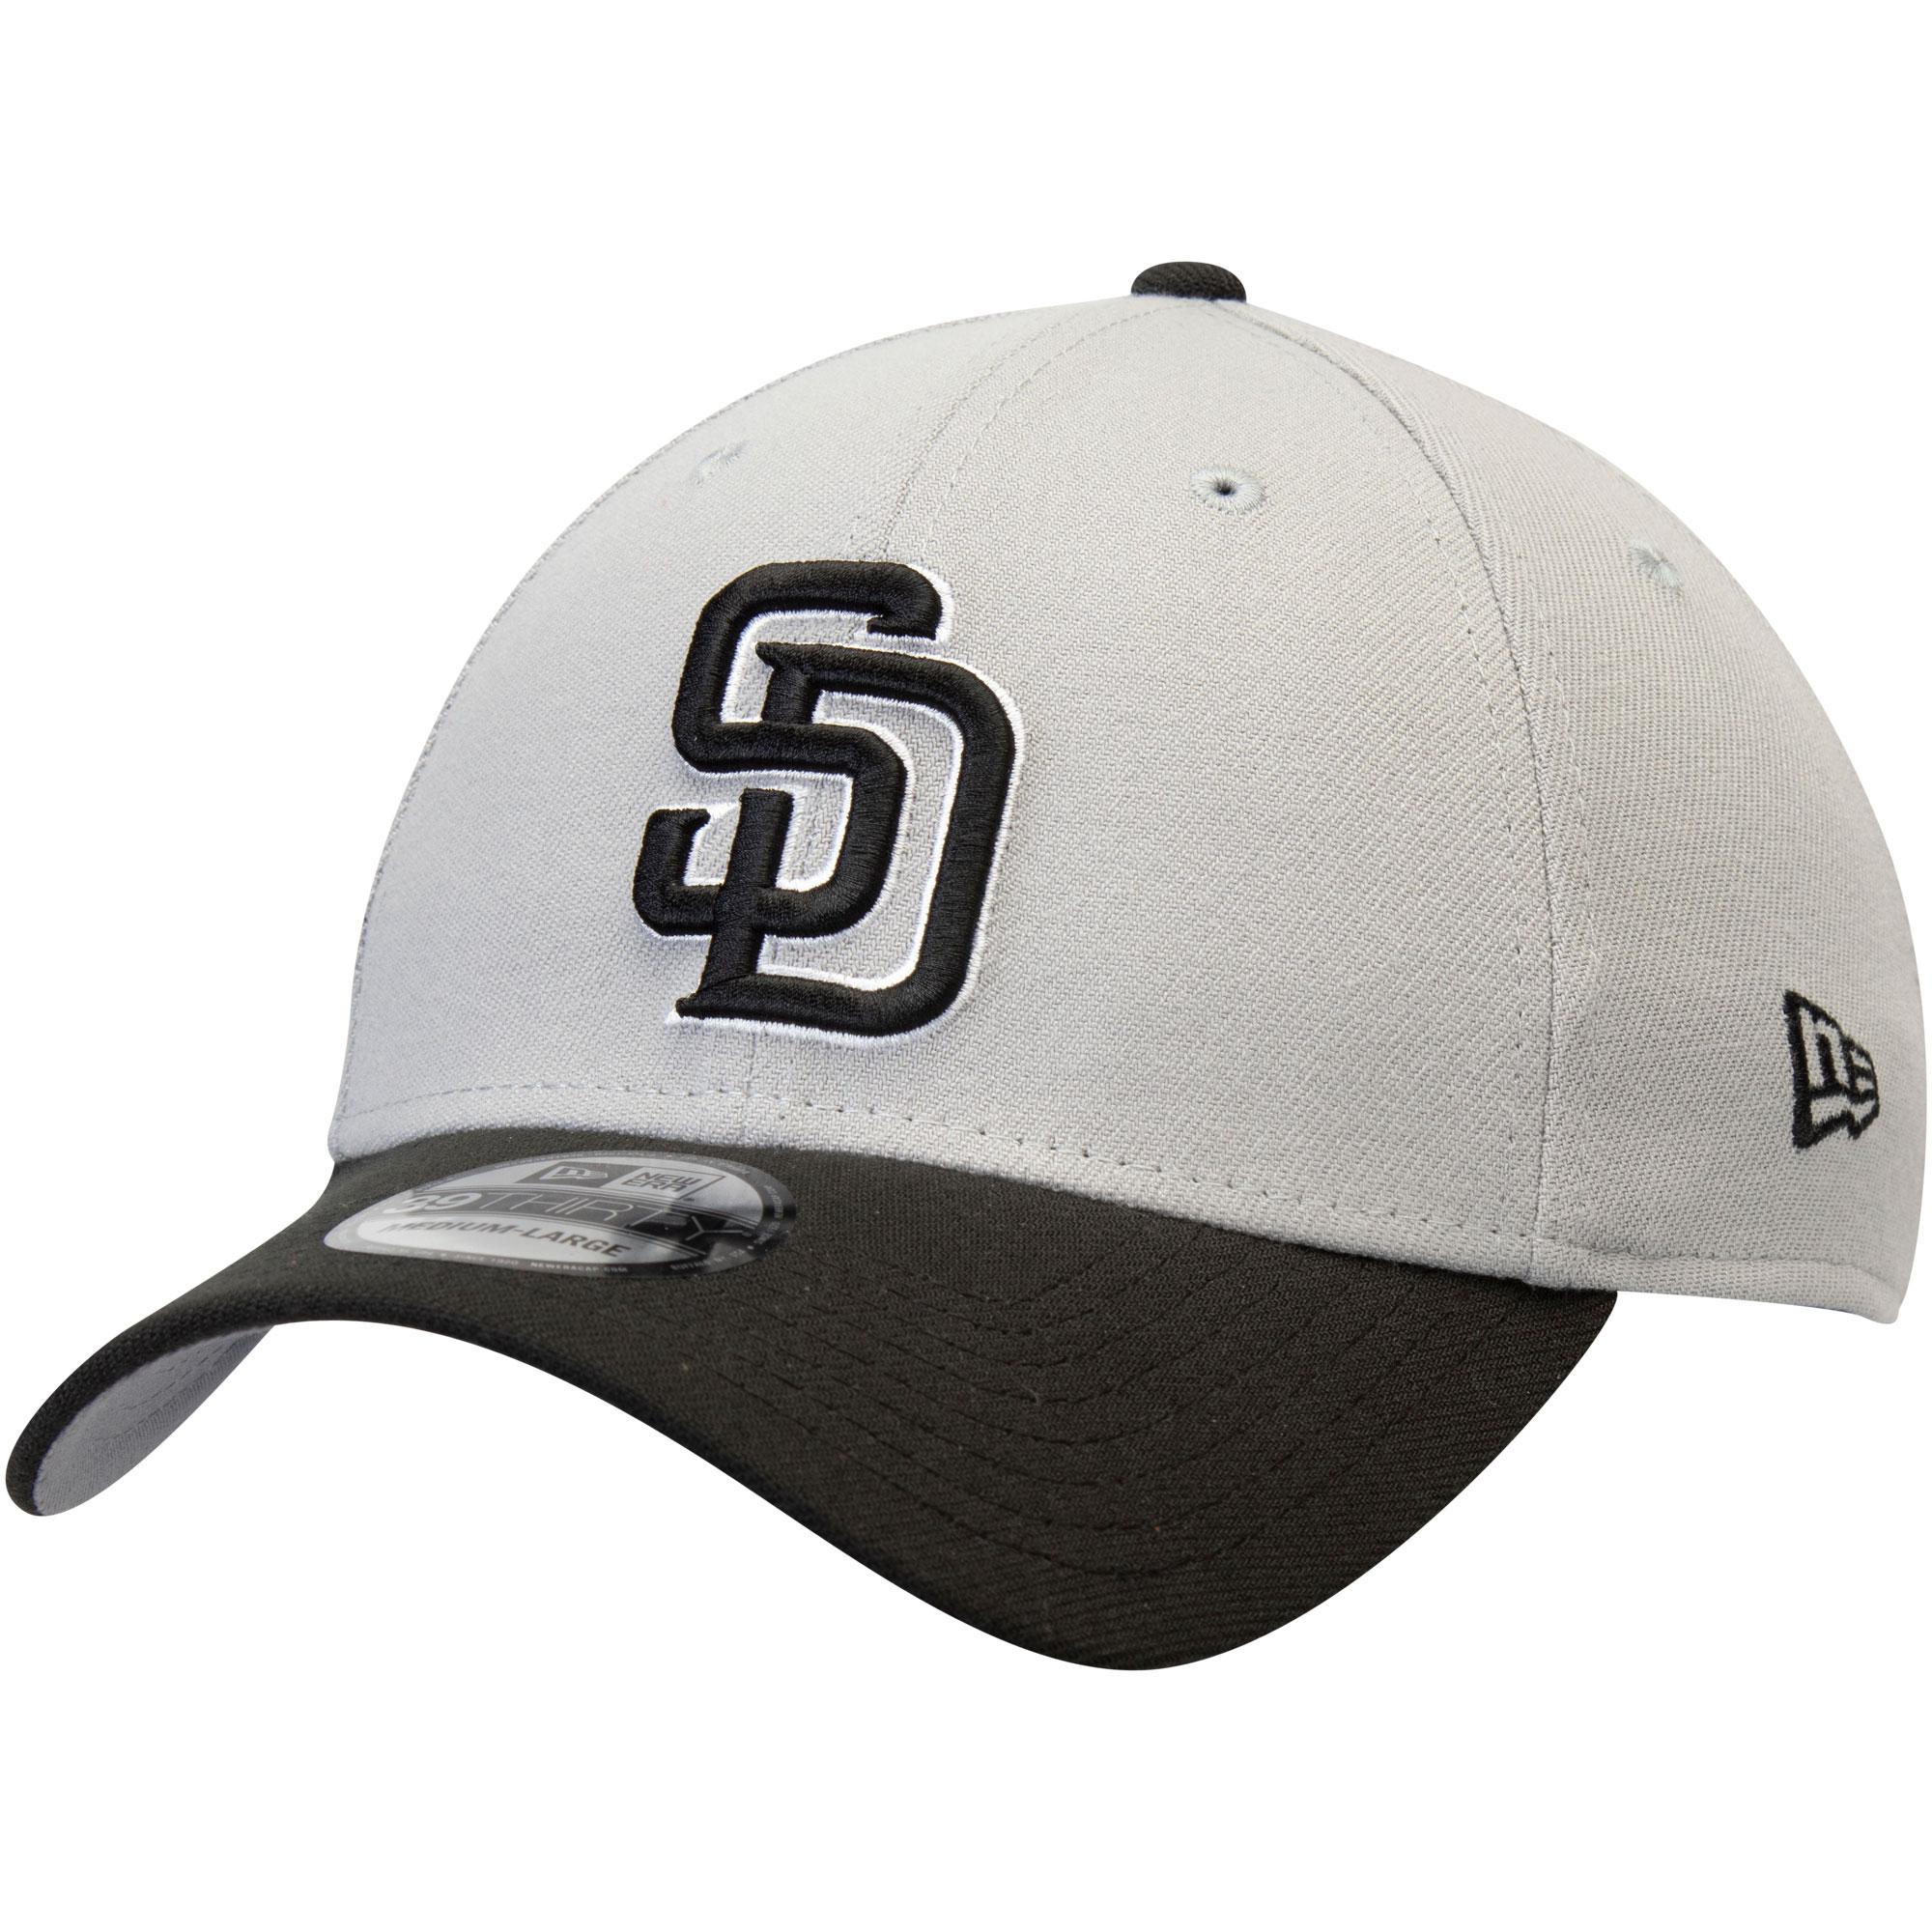 San Diego Padres New Era Team Classic 39THIRTY Flex Hat - Gray/Black